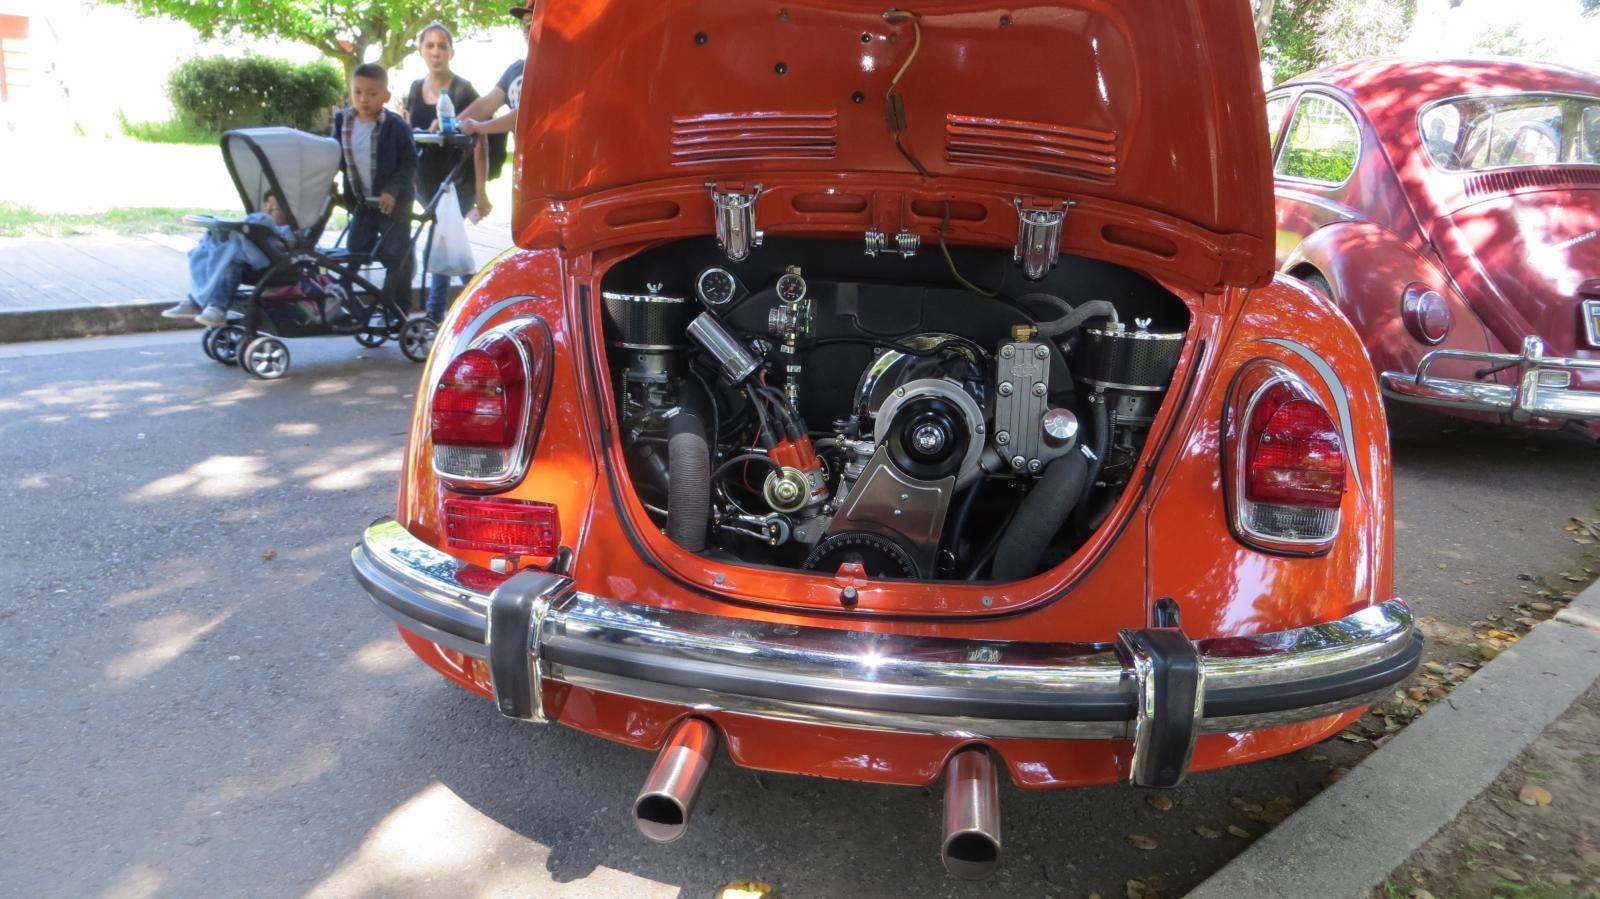 1971 Duper Beetle GTV at Kelly Park April 23rd, 2017 (Kelly Park, San Jose, CA)